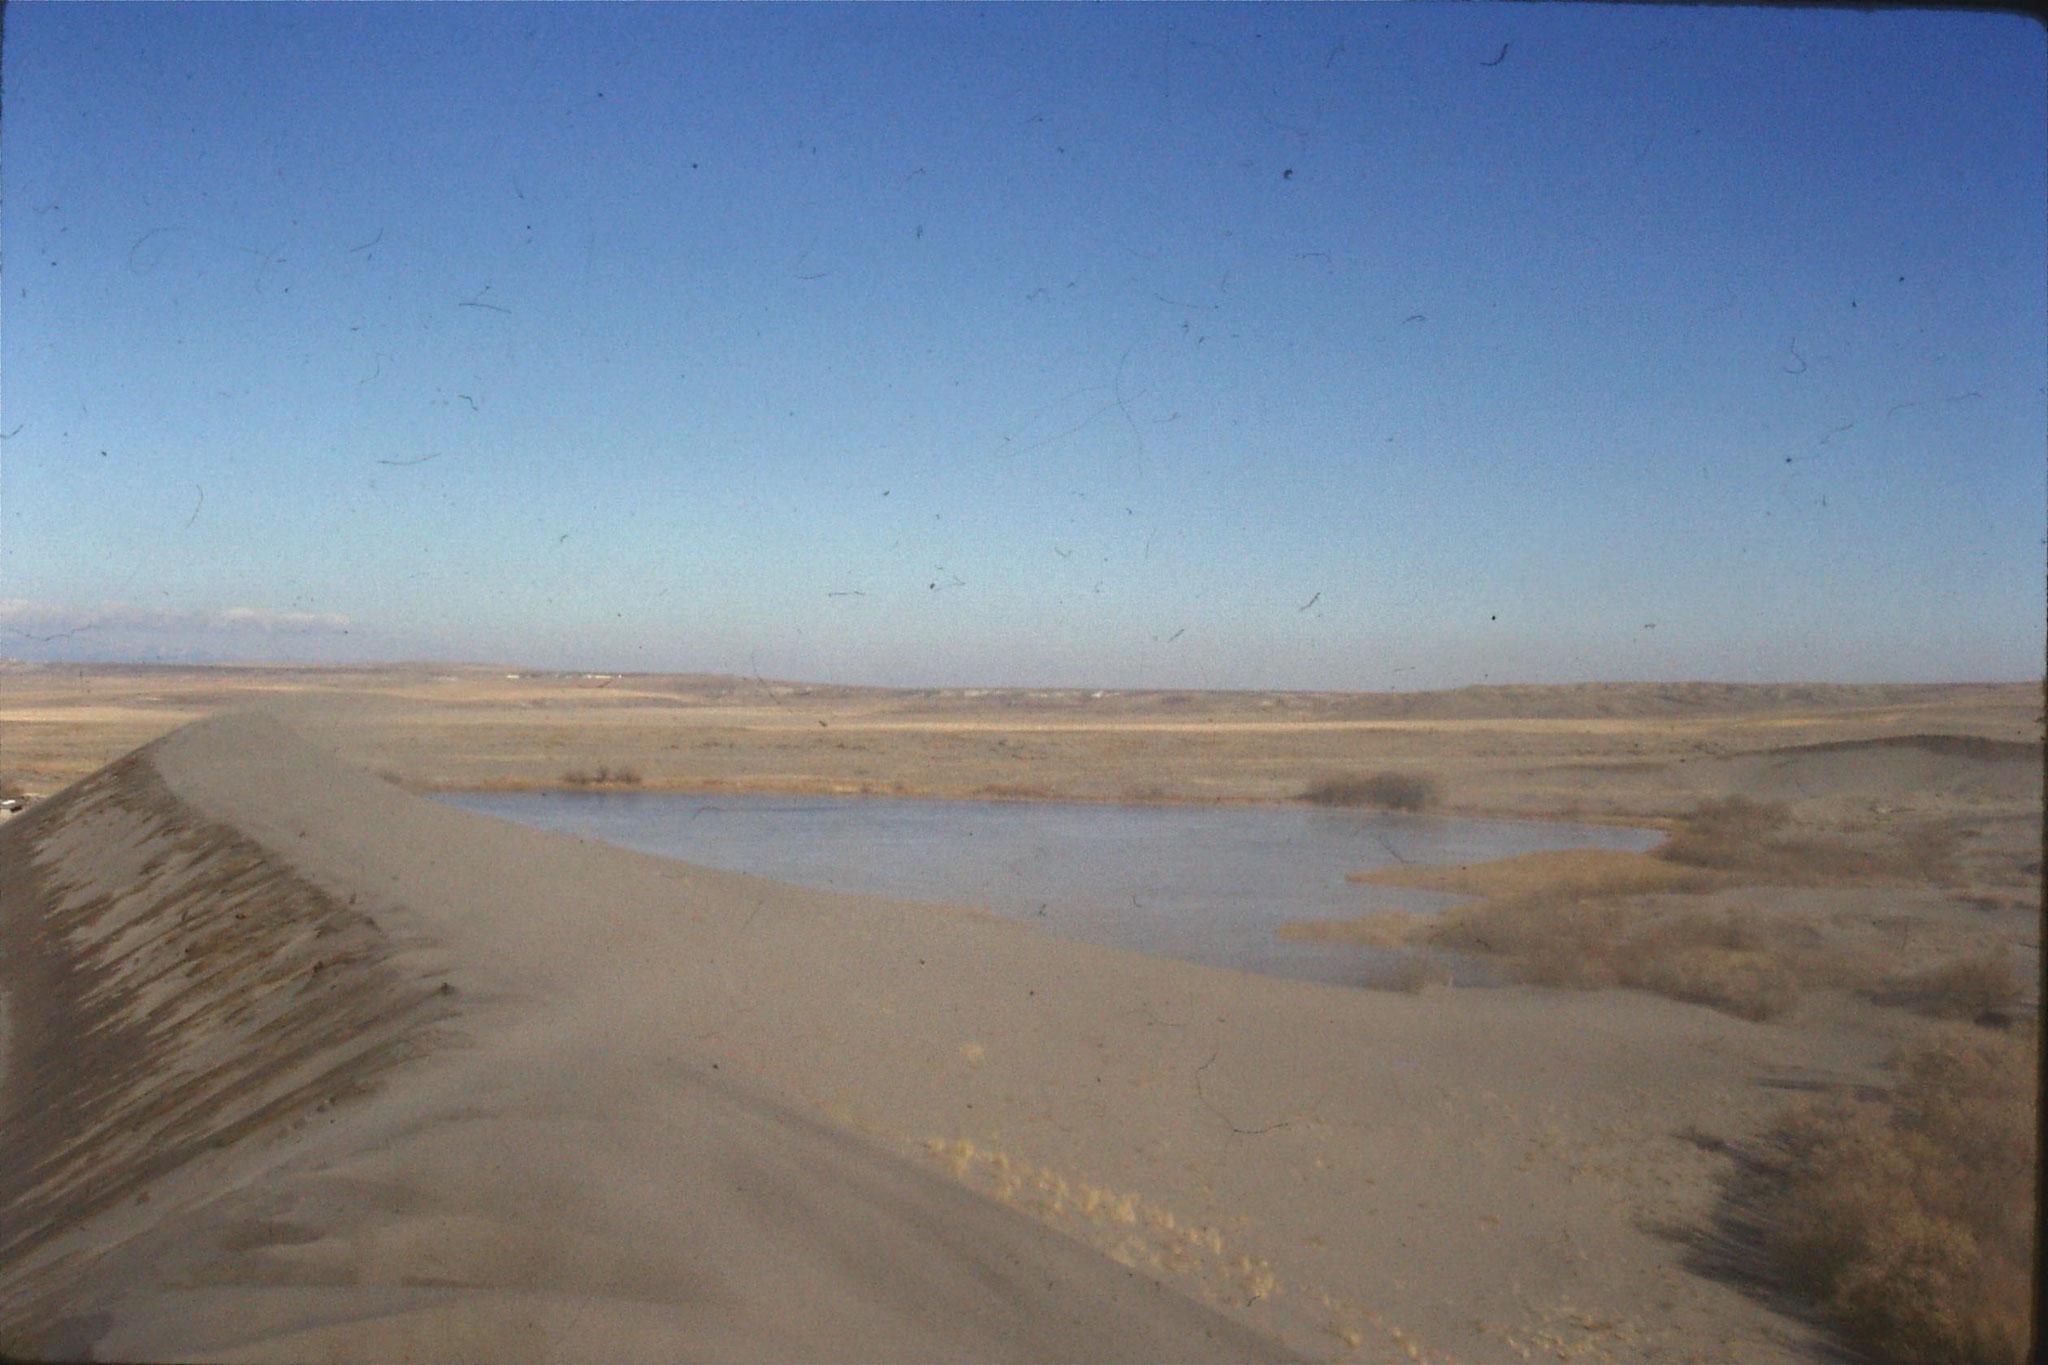 24/1/1991: 34: Bruneau Sand Dunes